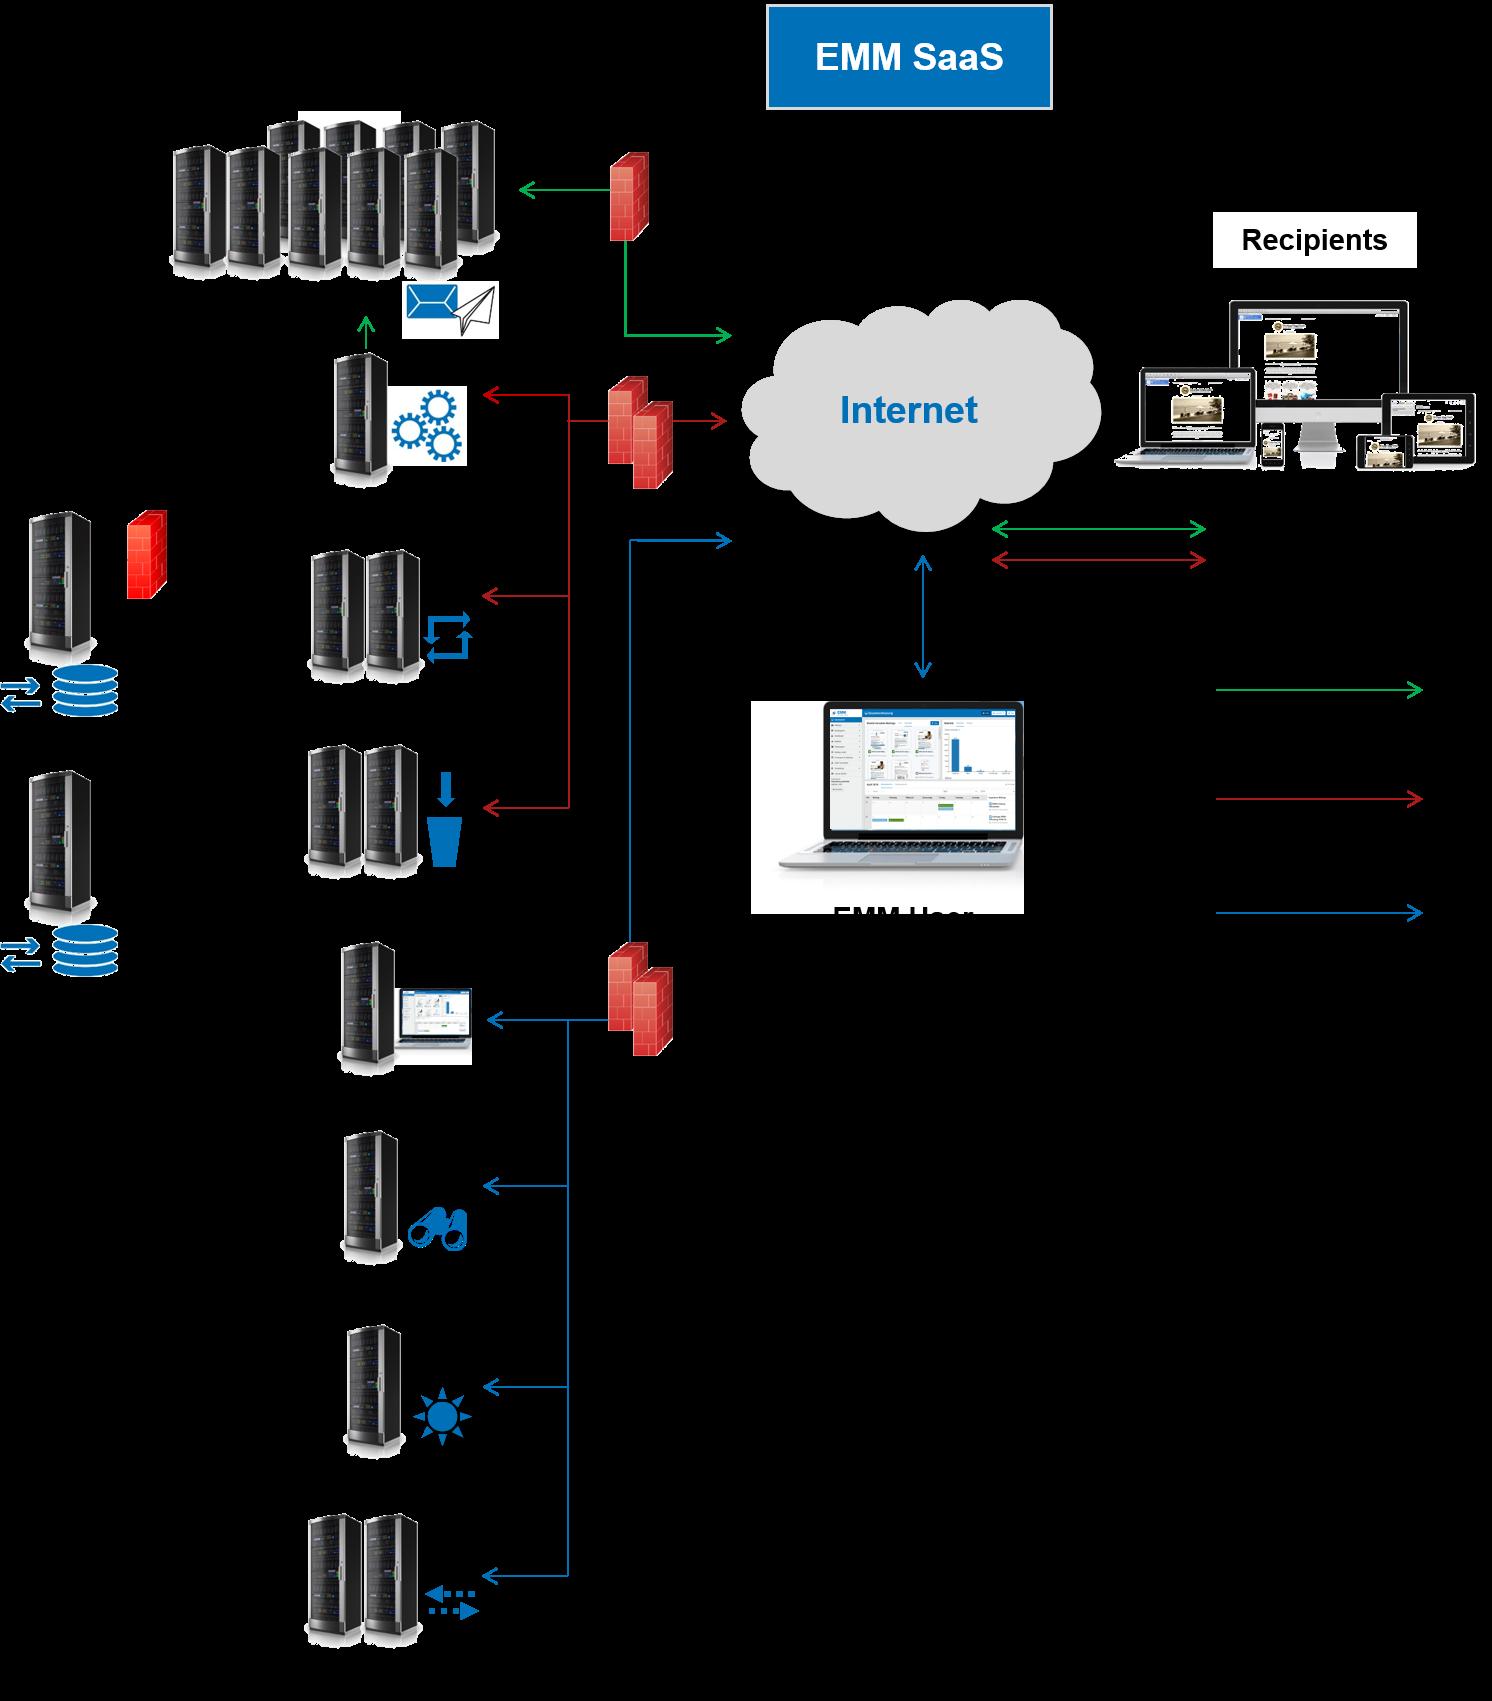 Scheme of system landscape EMM SaaS